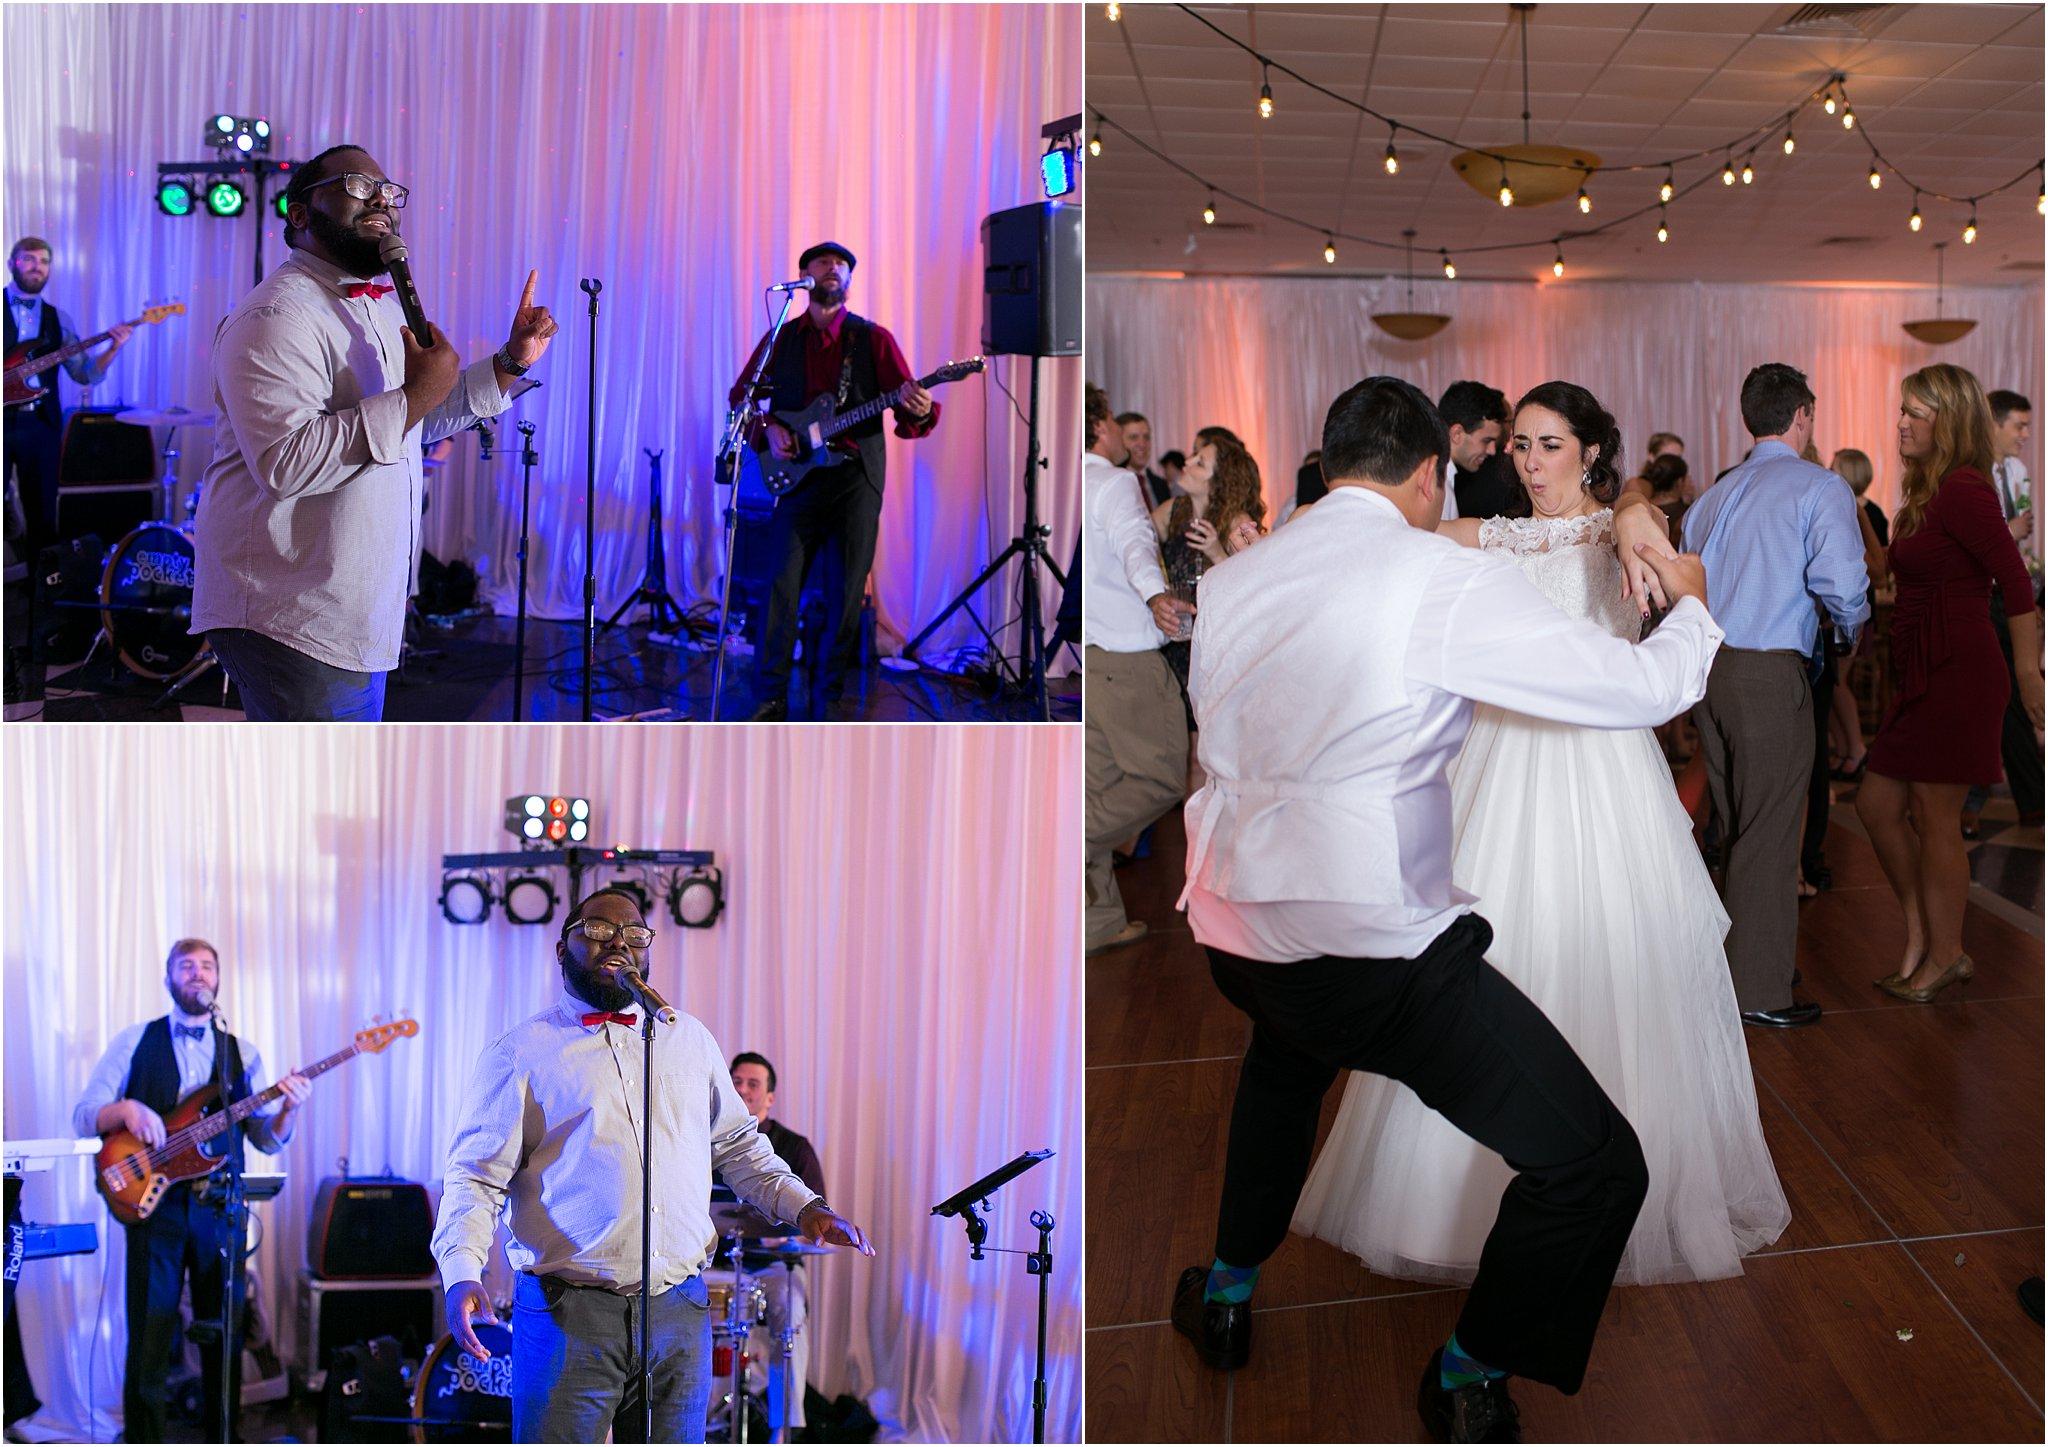 jessica_ryan_photography_virginia_wedding_photographer_wedding_hurricane_norfolk_botanical_gardens_hurricane_matthew_wedding_3649